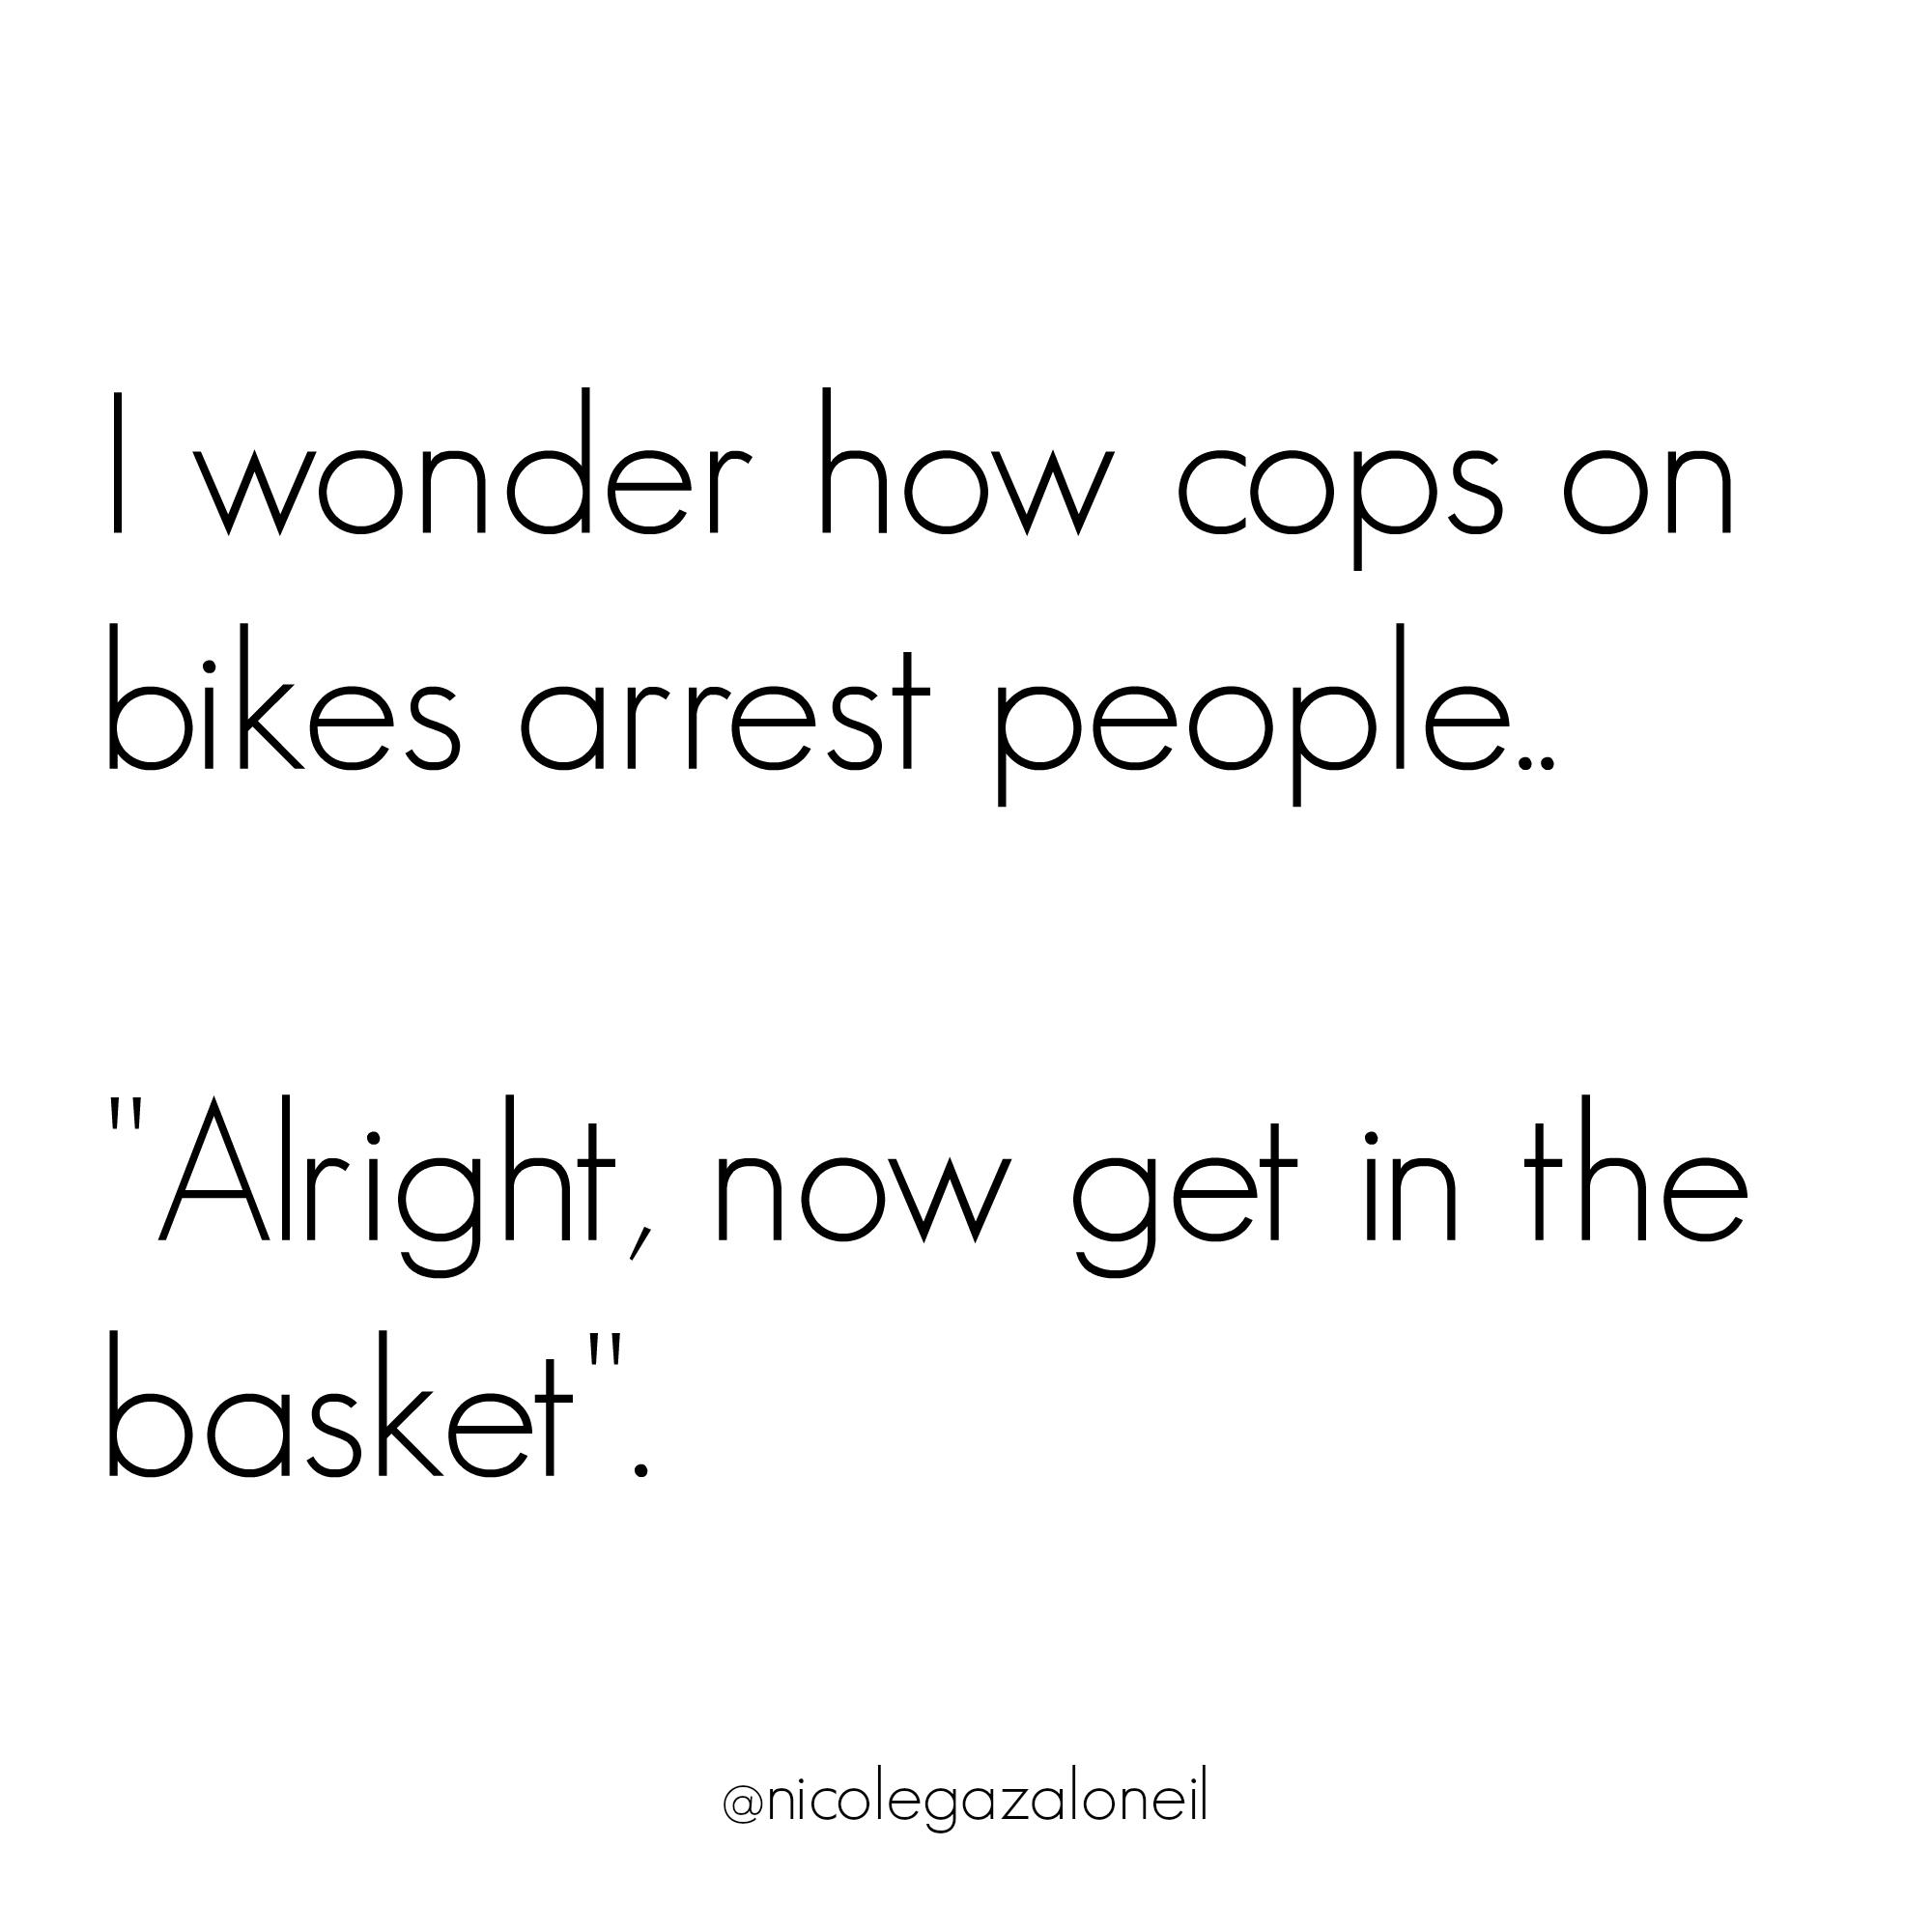 I wonder how cops on bikes arrest people.jpg